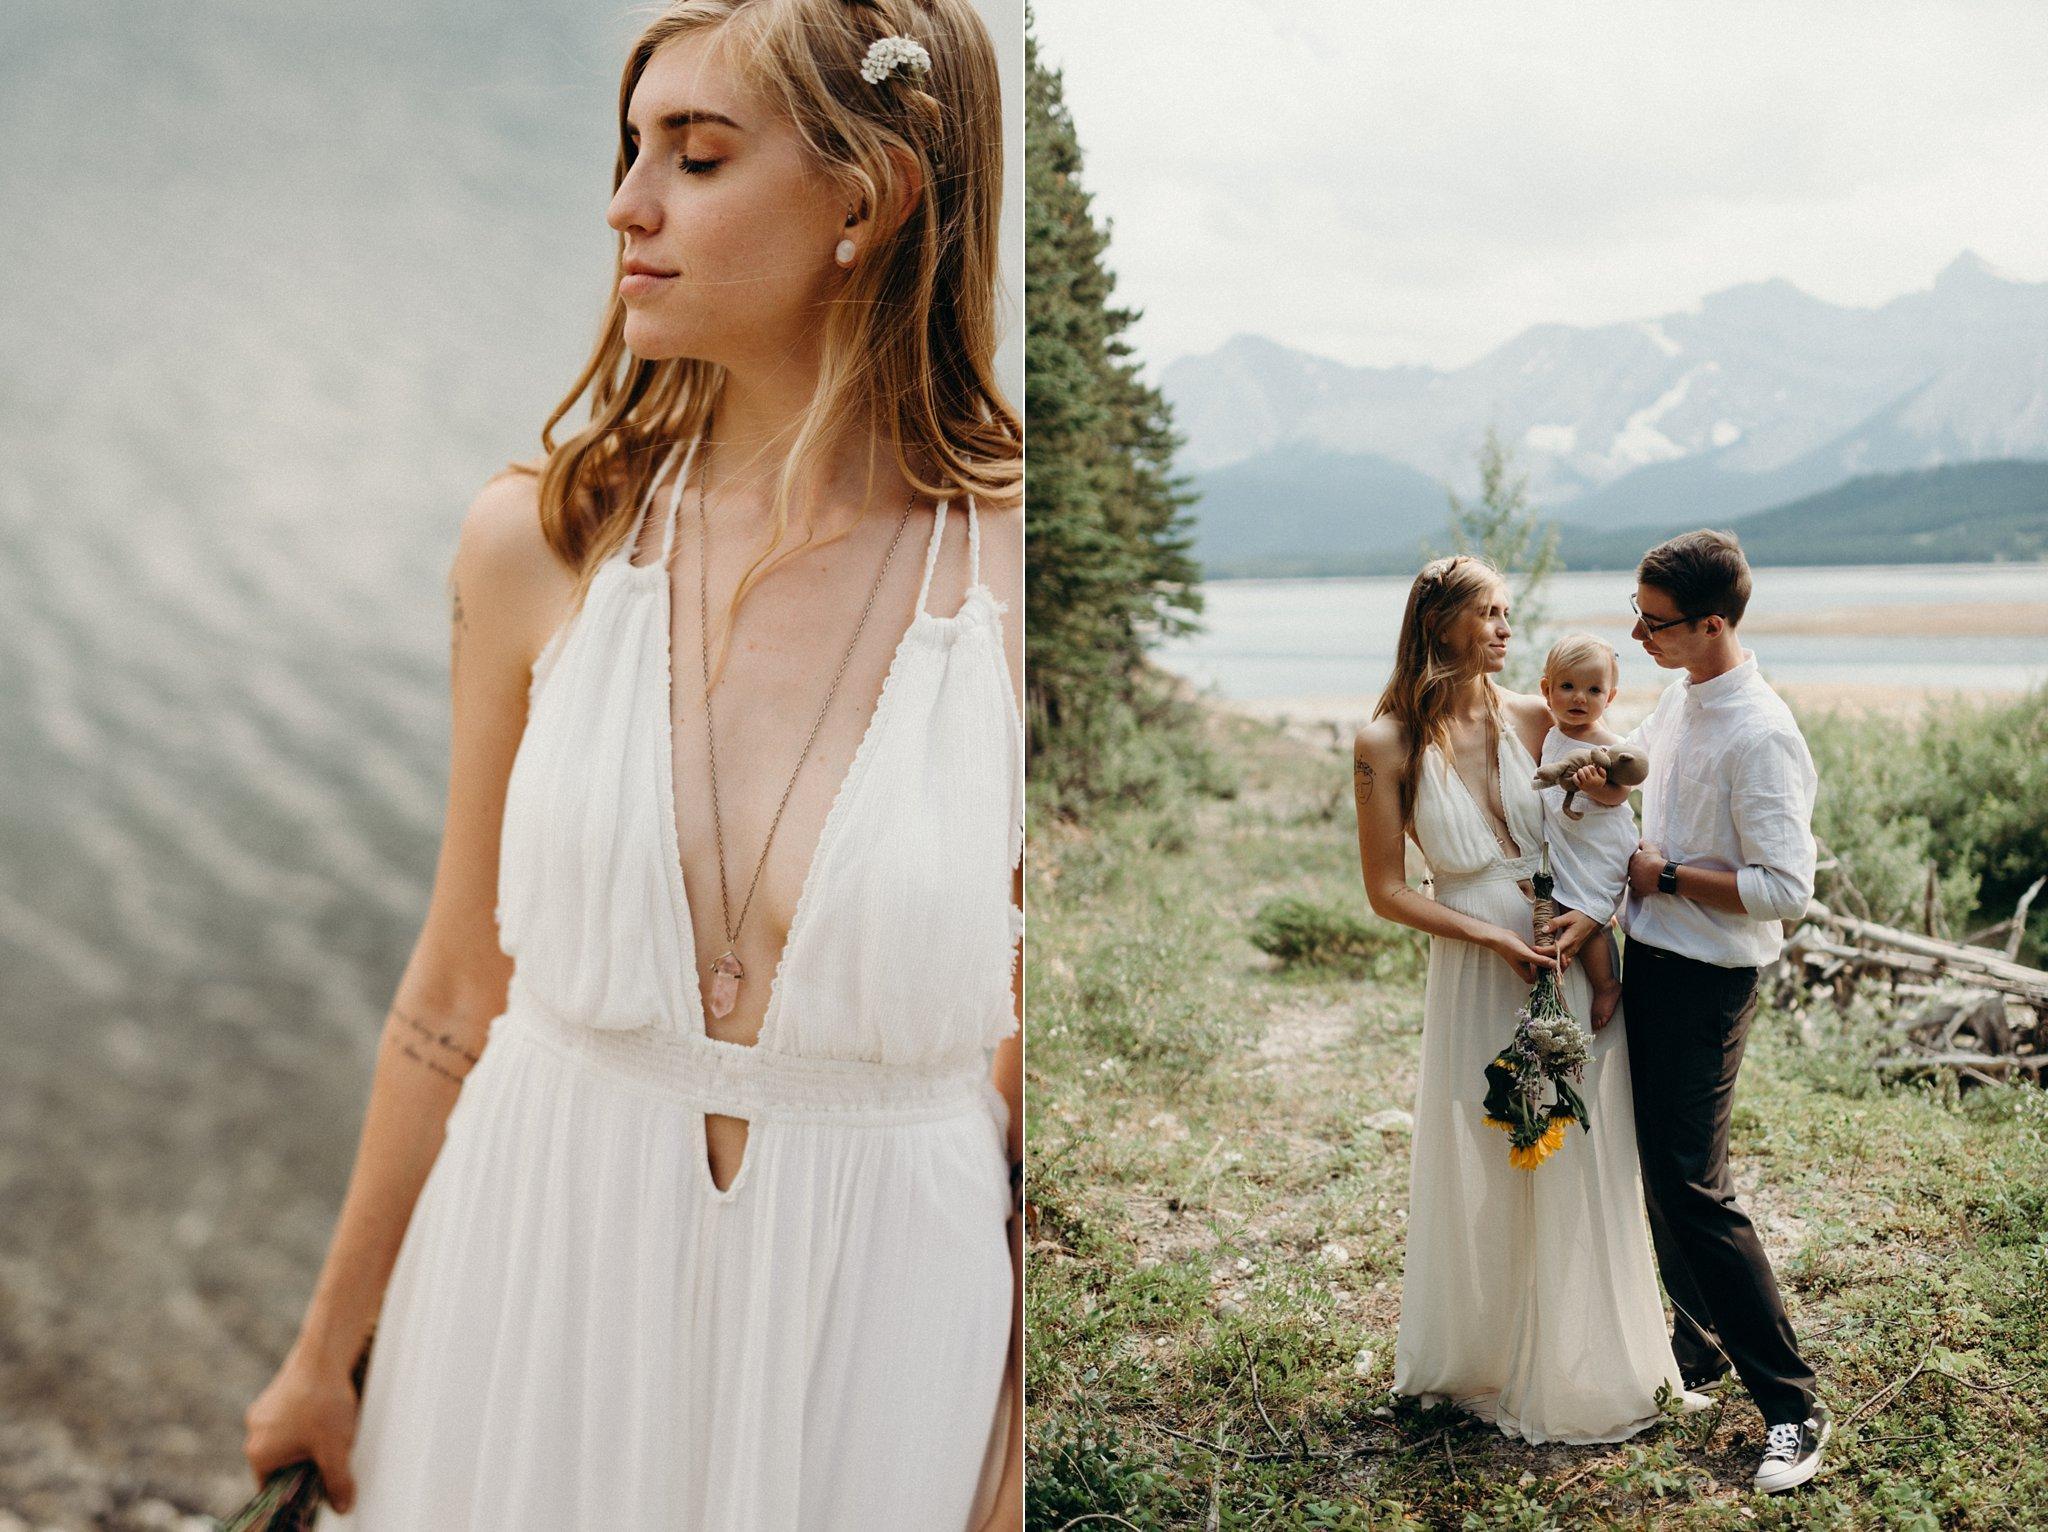 kaihla_tonai_intimate_wedding_elopement_photographer_6412.jpg